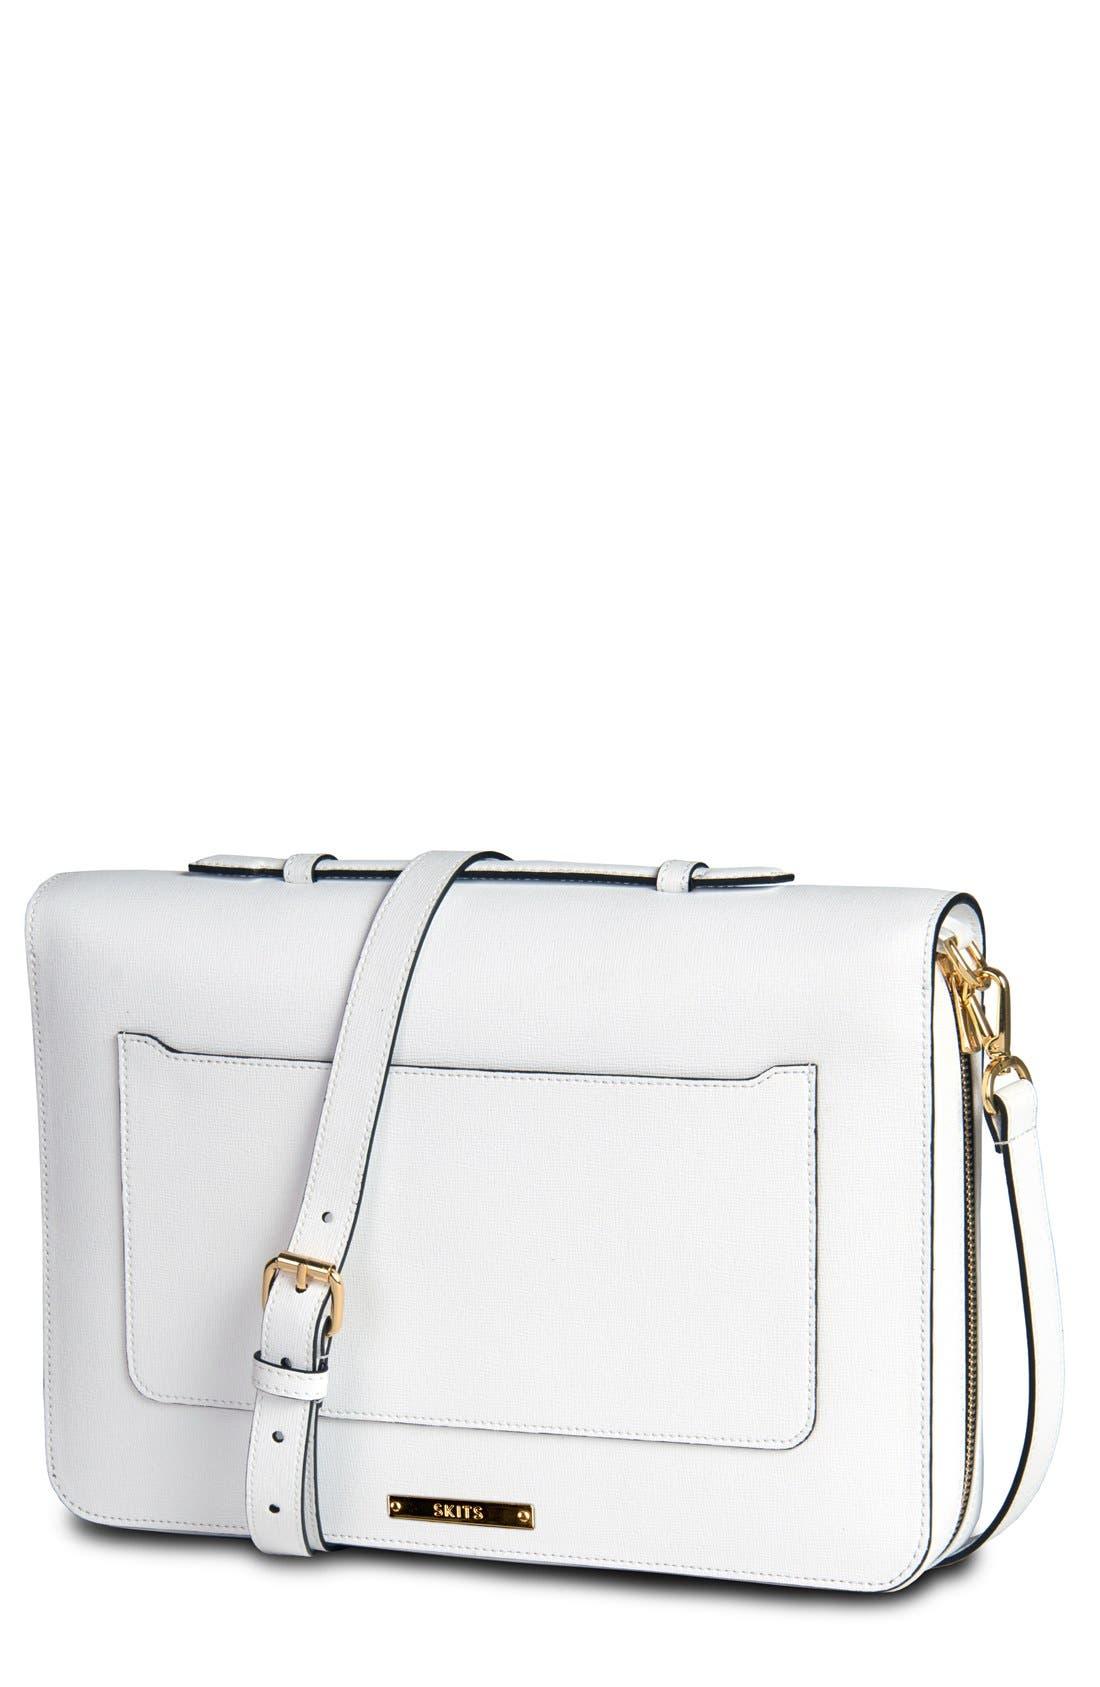 SKITS Providence Brilliant Leather Tech Bag